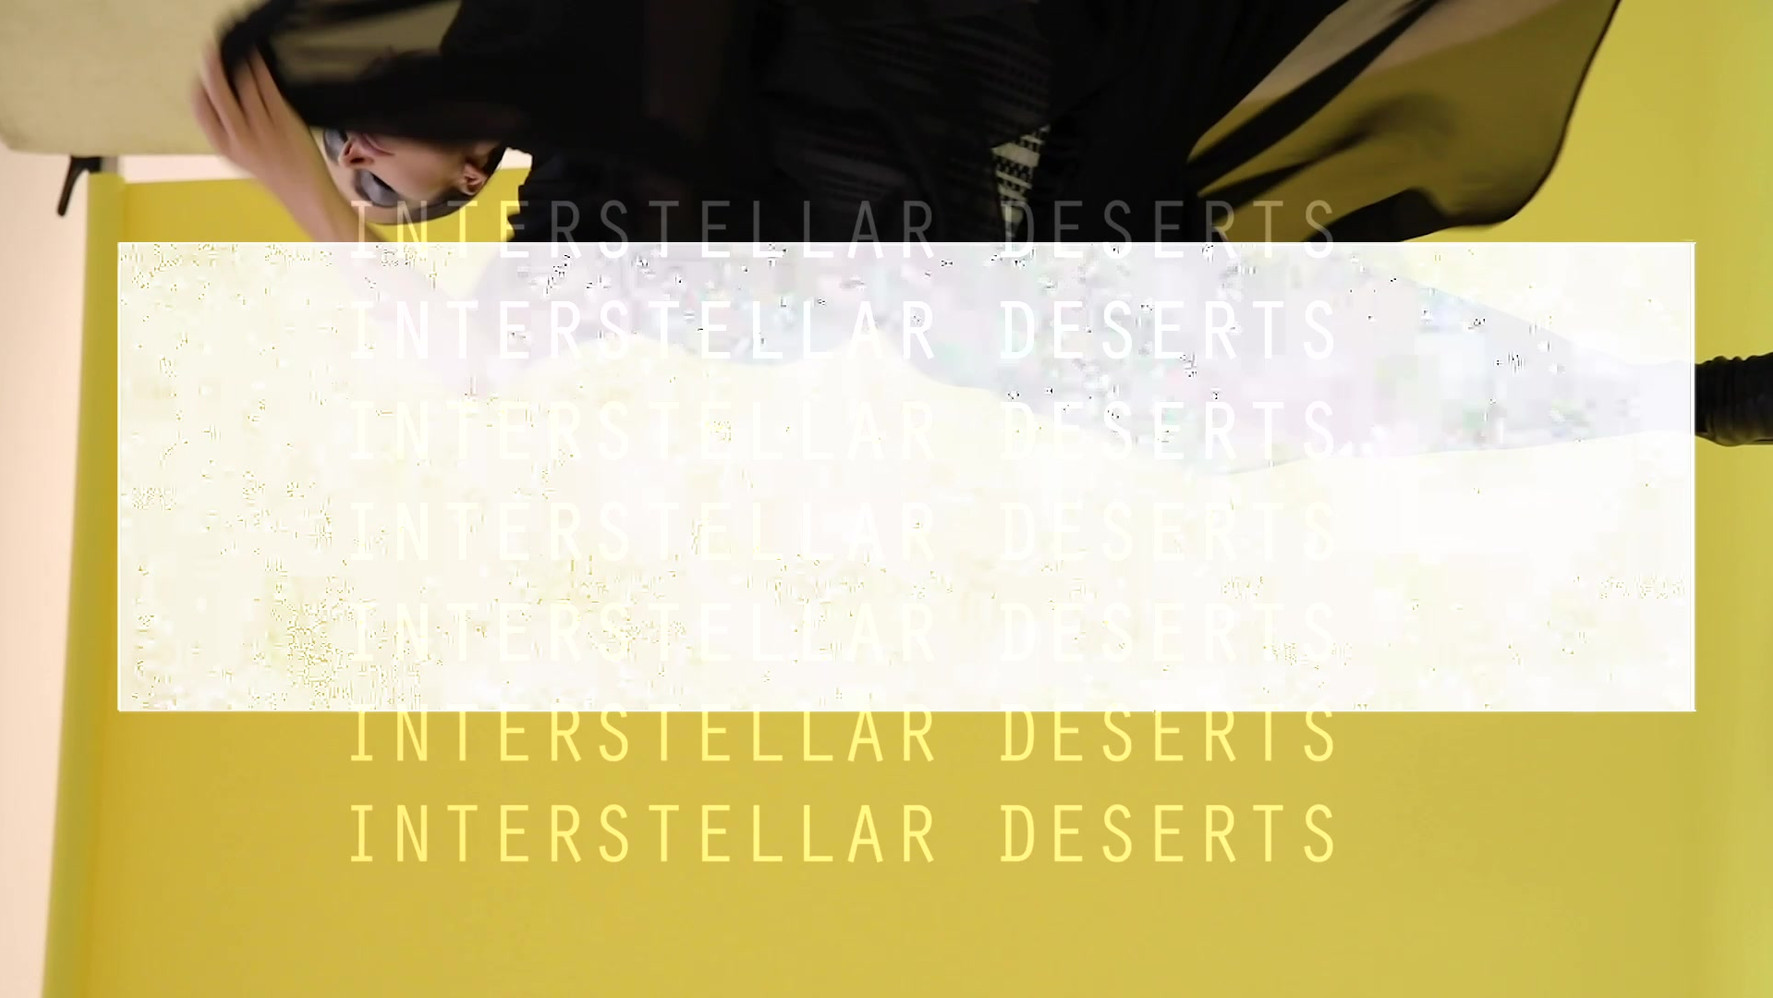 SPOT interstellar deserts #pierantoniogaspari model #YuliyaPaul #summerspring #collection #ss2020 #previewcollection #milan #director #annabertozzi